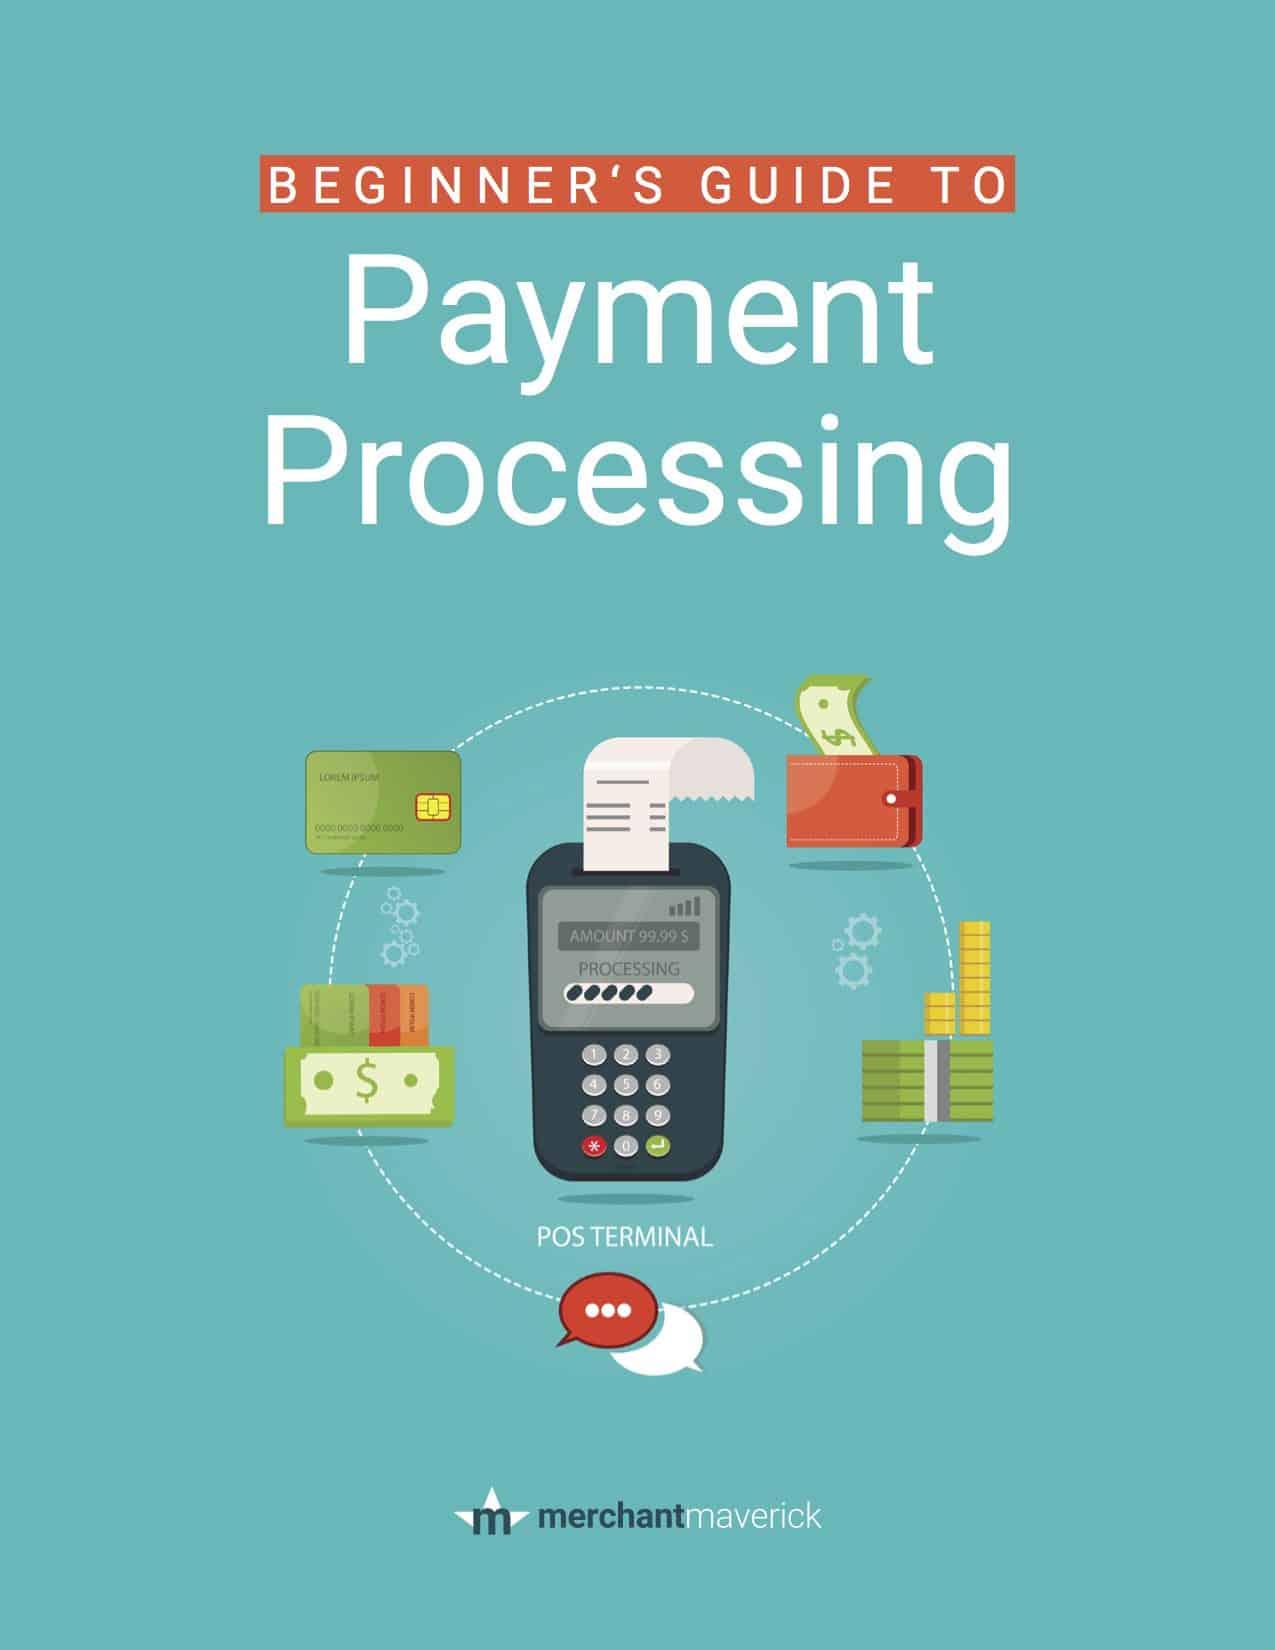 Beginner's Guide to Payment Processing - Merchant Maverick